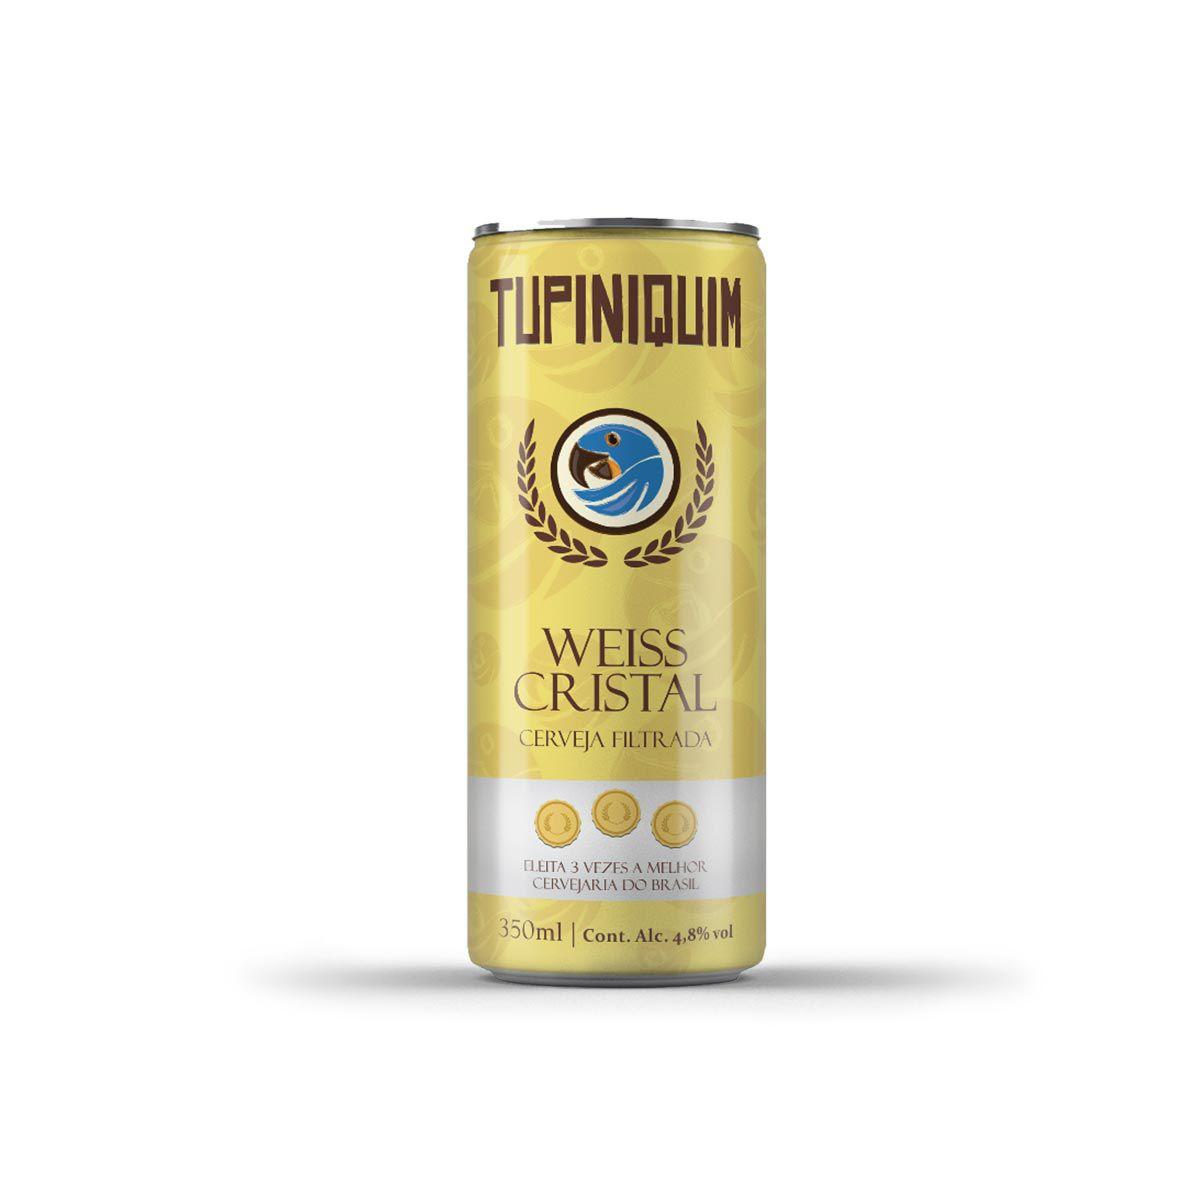 Tupiniquim Weiss Cristal 350ml lata